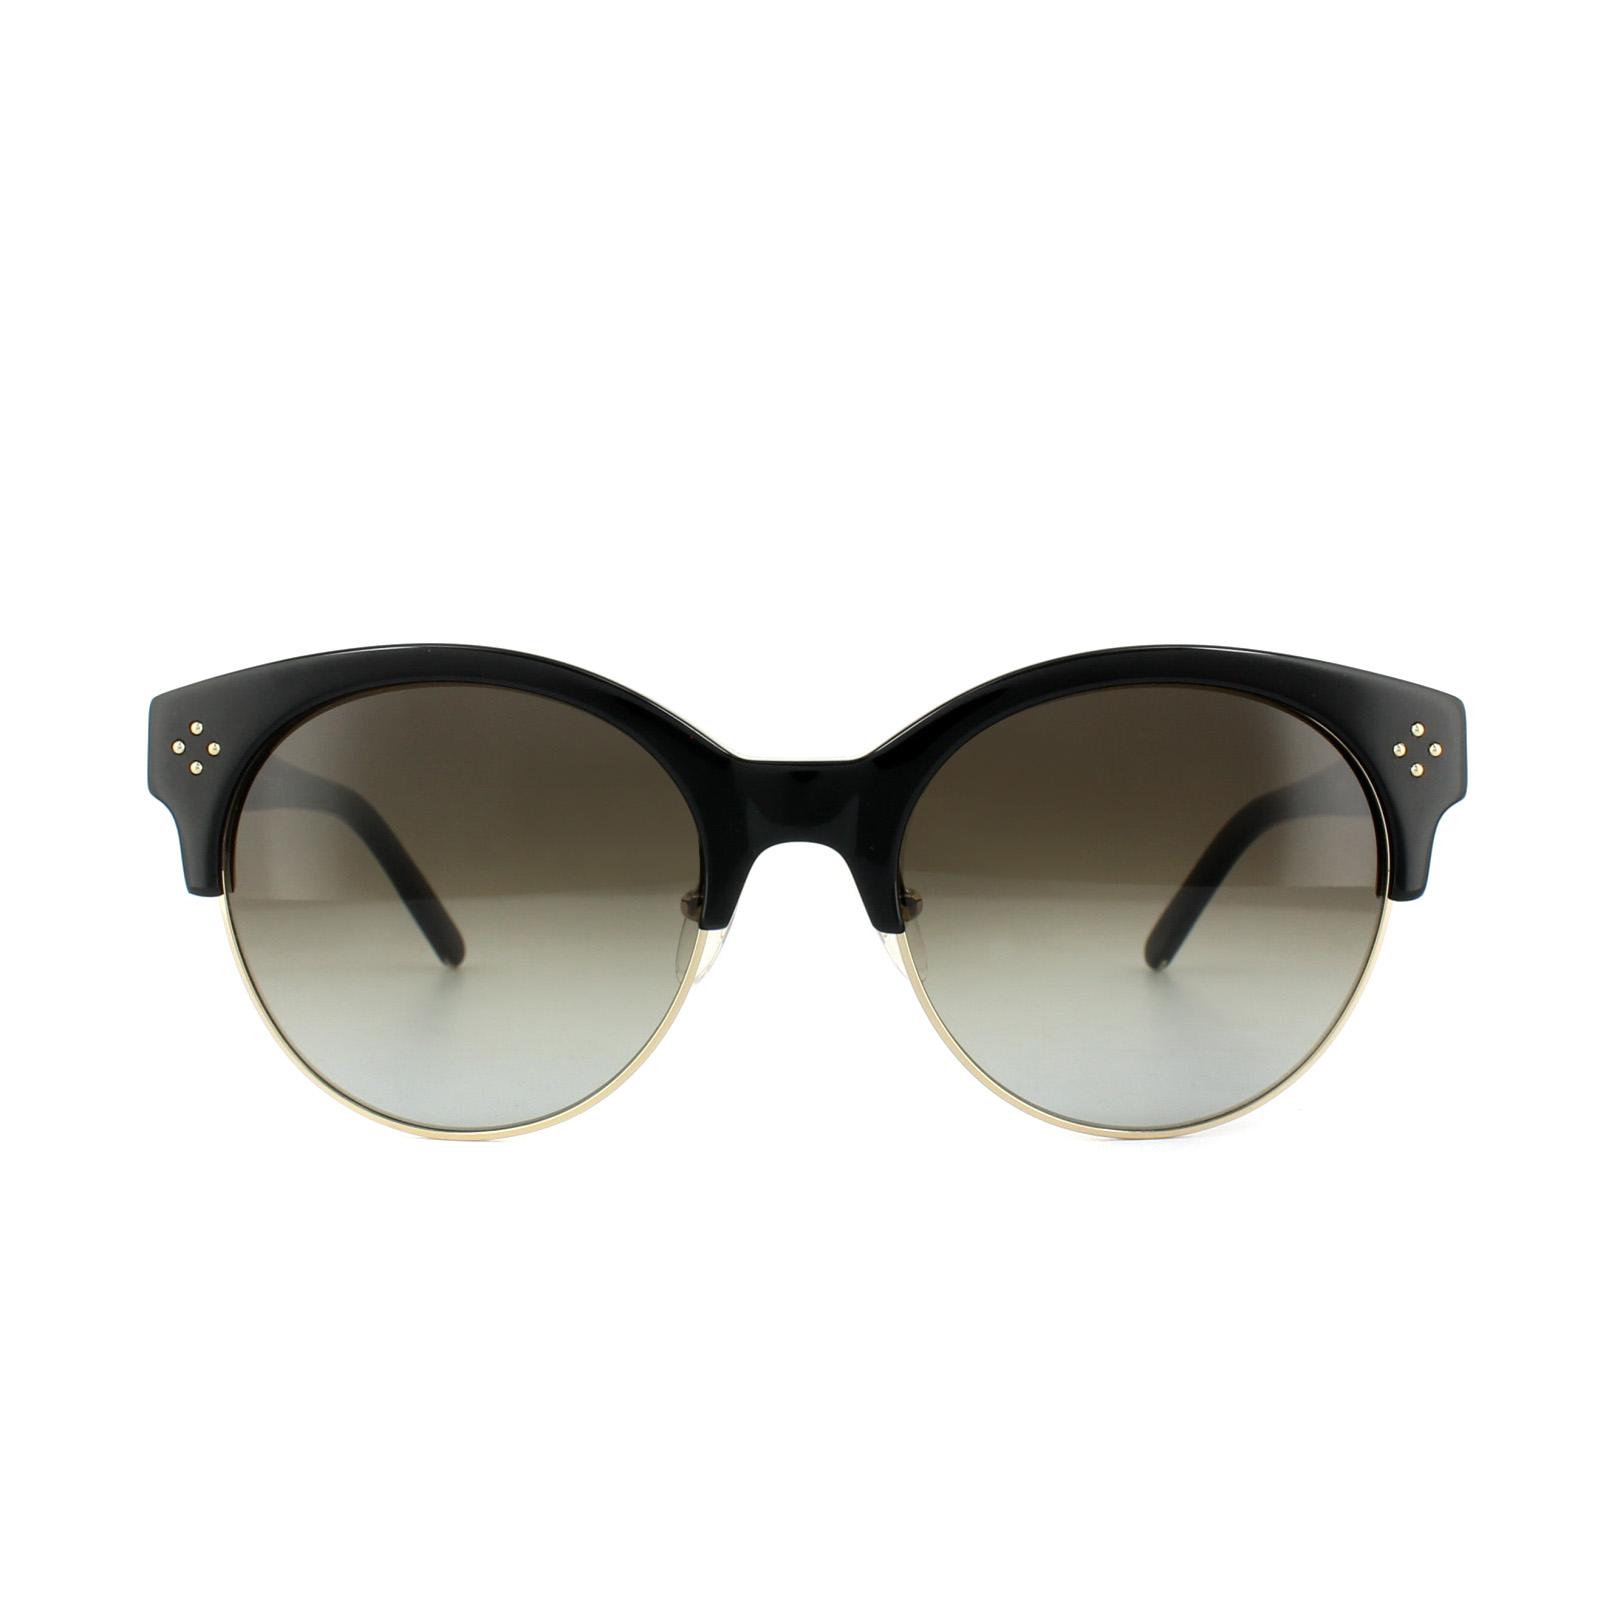 475f271a691 Sentinel Chloe Sunglasses CE704S Boxwood 001 Black Gold Grey Gradient